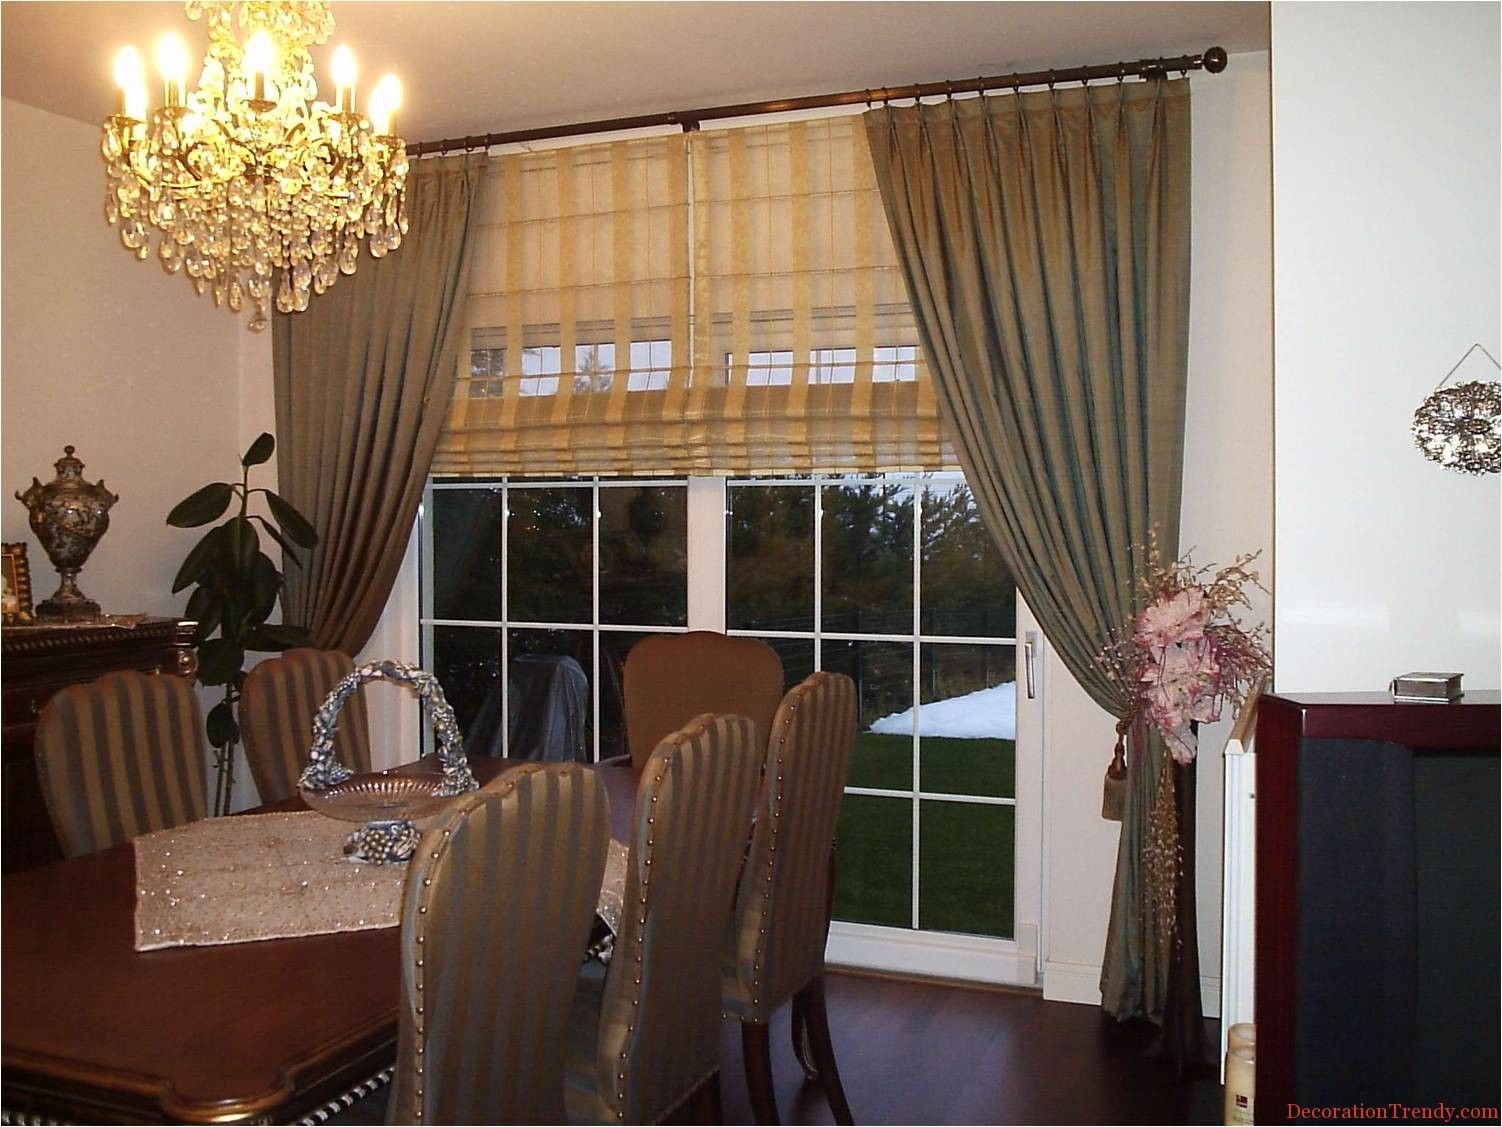 2014 Modern Curtain Fabric Models Design Decor 13 Best Curtain Fabric Design  Decor For 2014